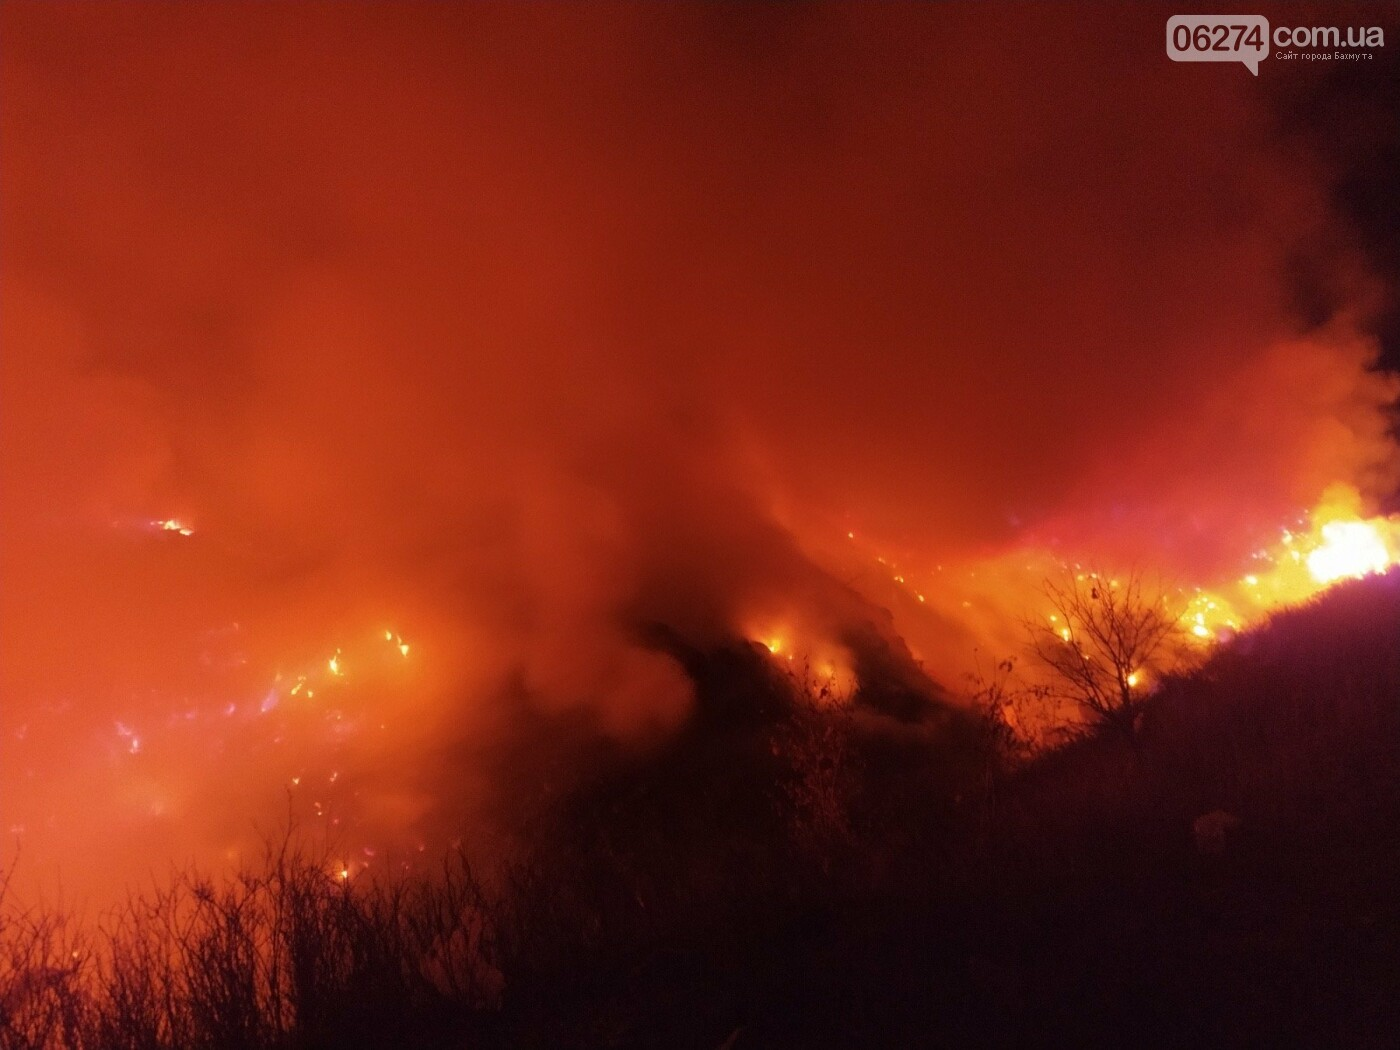 Спасатели ликвидировали пожар на полигоне ТБО вблизи Бахмута, фото-1